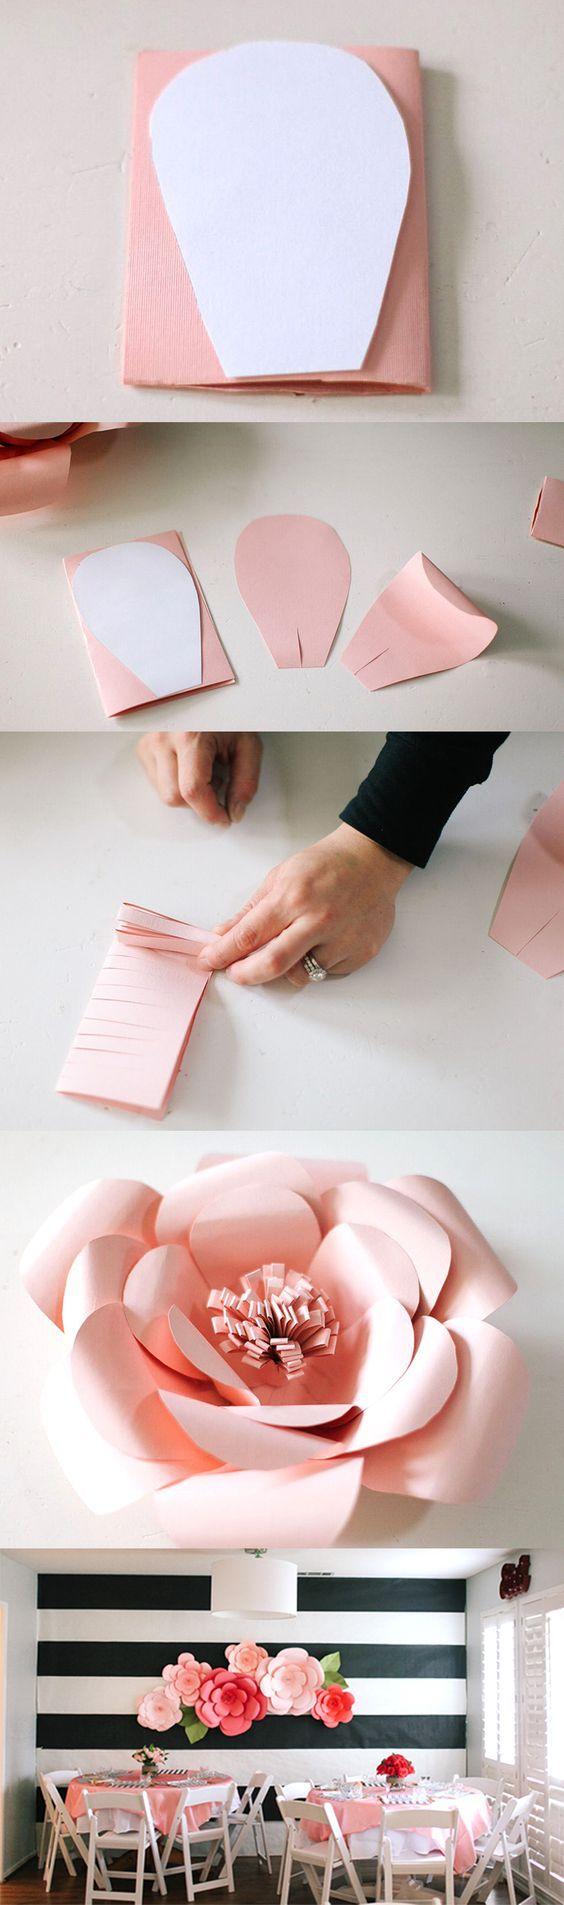 Origami Blumen als Dekoration - DIY Deko Ideen